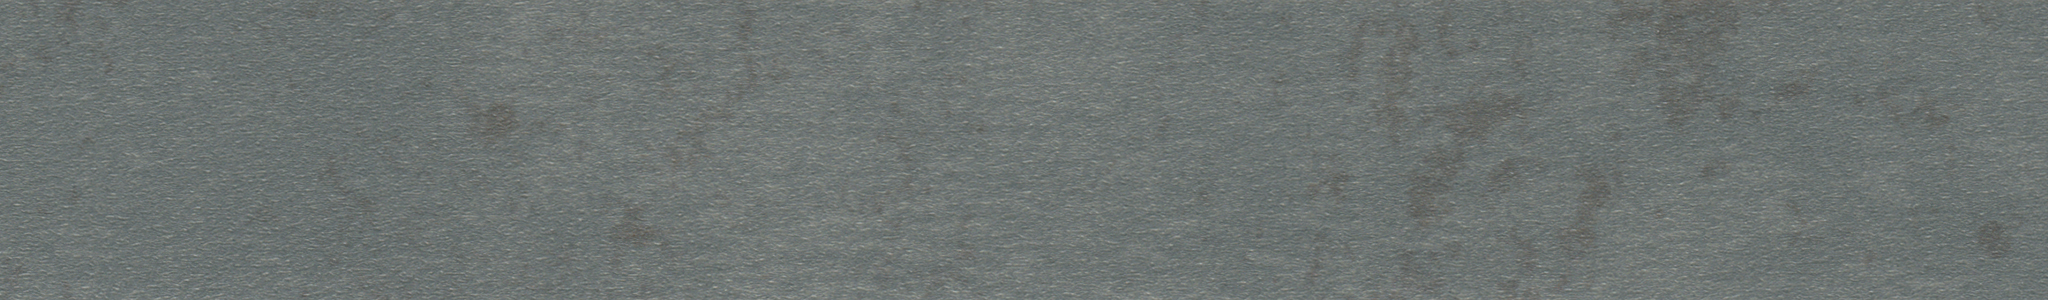 HD 296006 ABS hrana ocel žíhaná perla